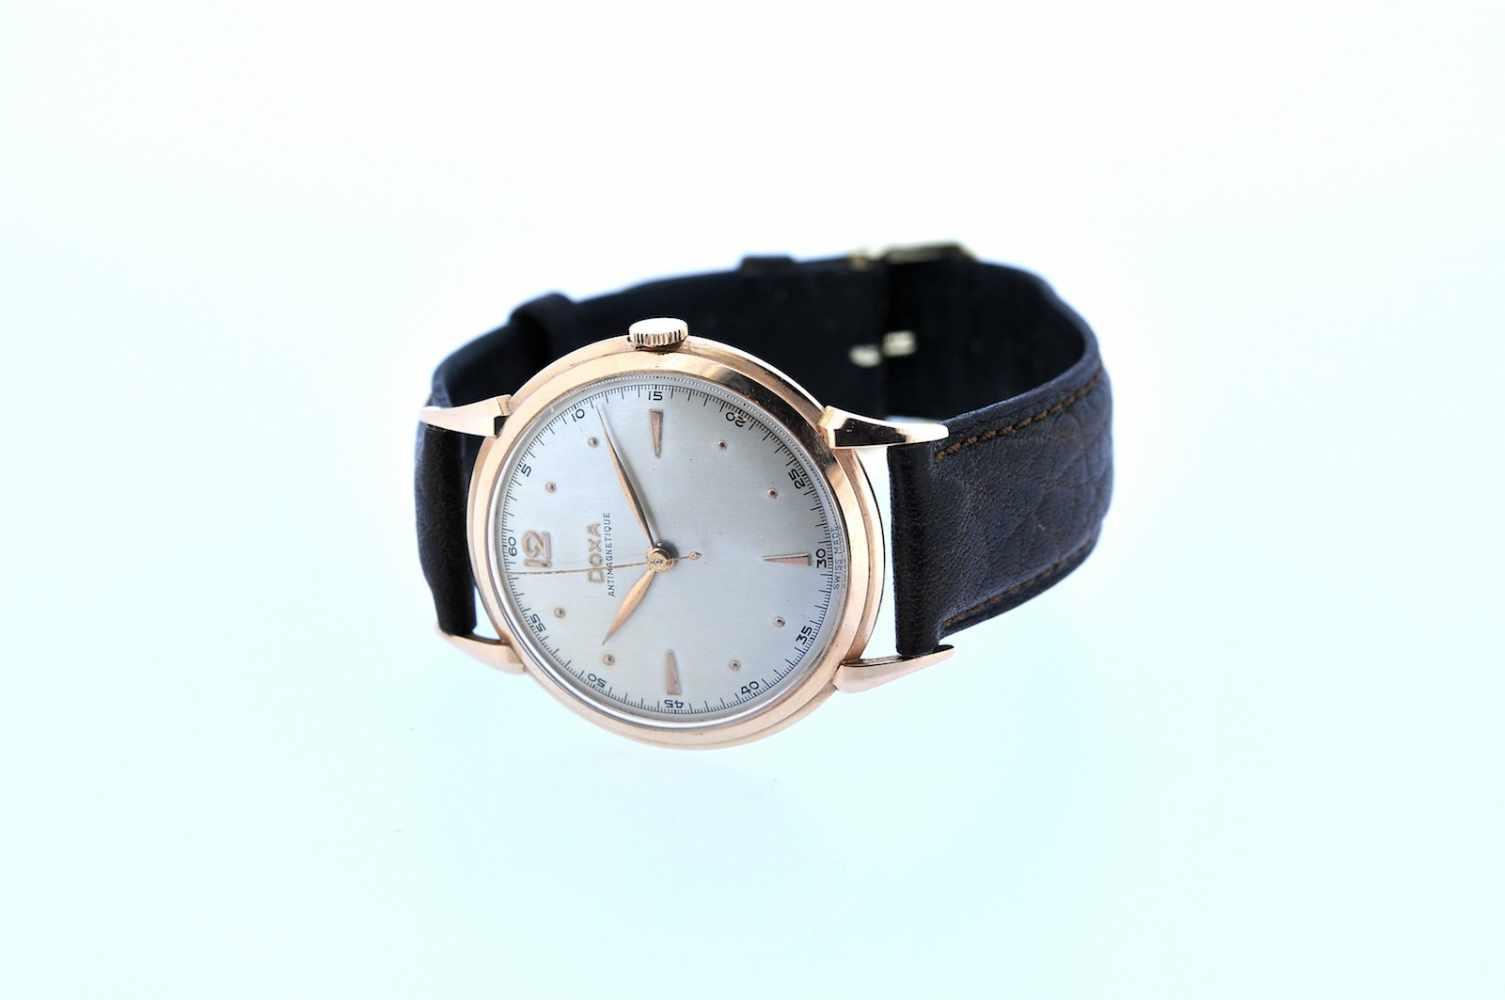 Doxa Roségoldene Armbanduhr an Lederband, Doxa Antimagnetique, Handaufzug, Ankerwerk, - Bild 2 aus 2